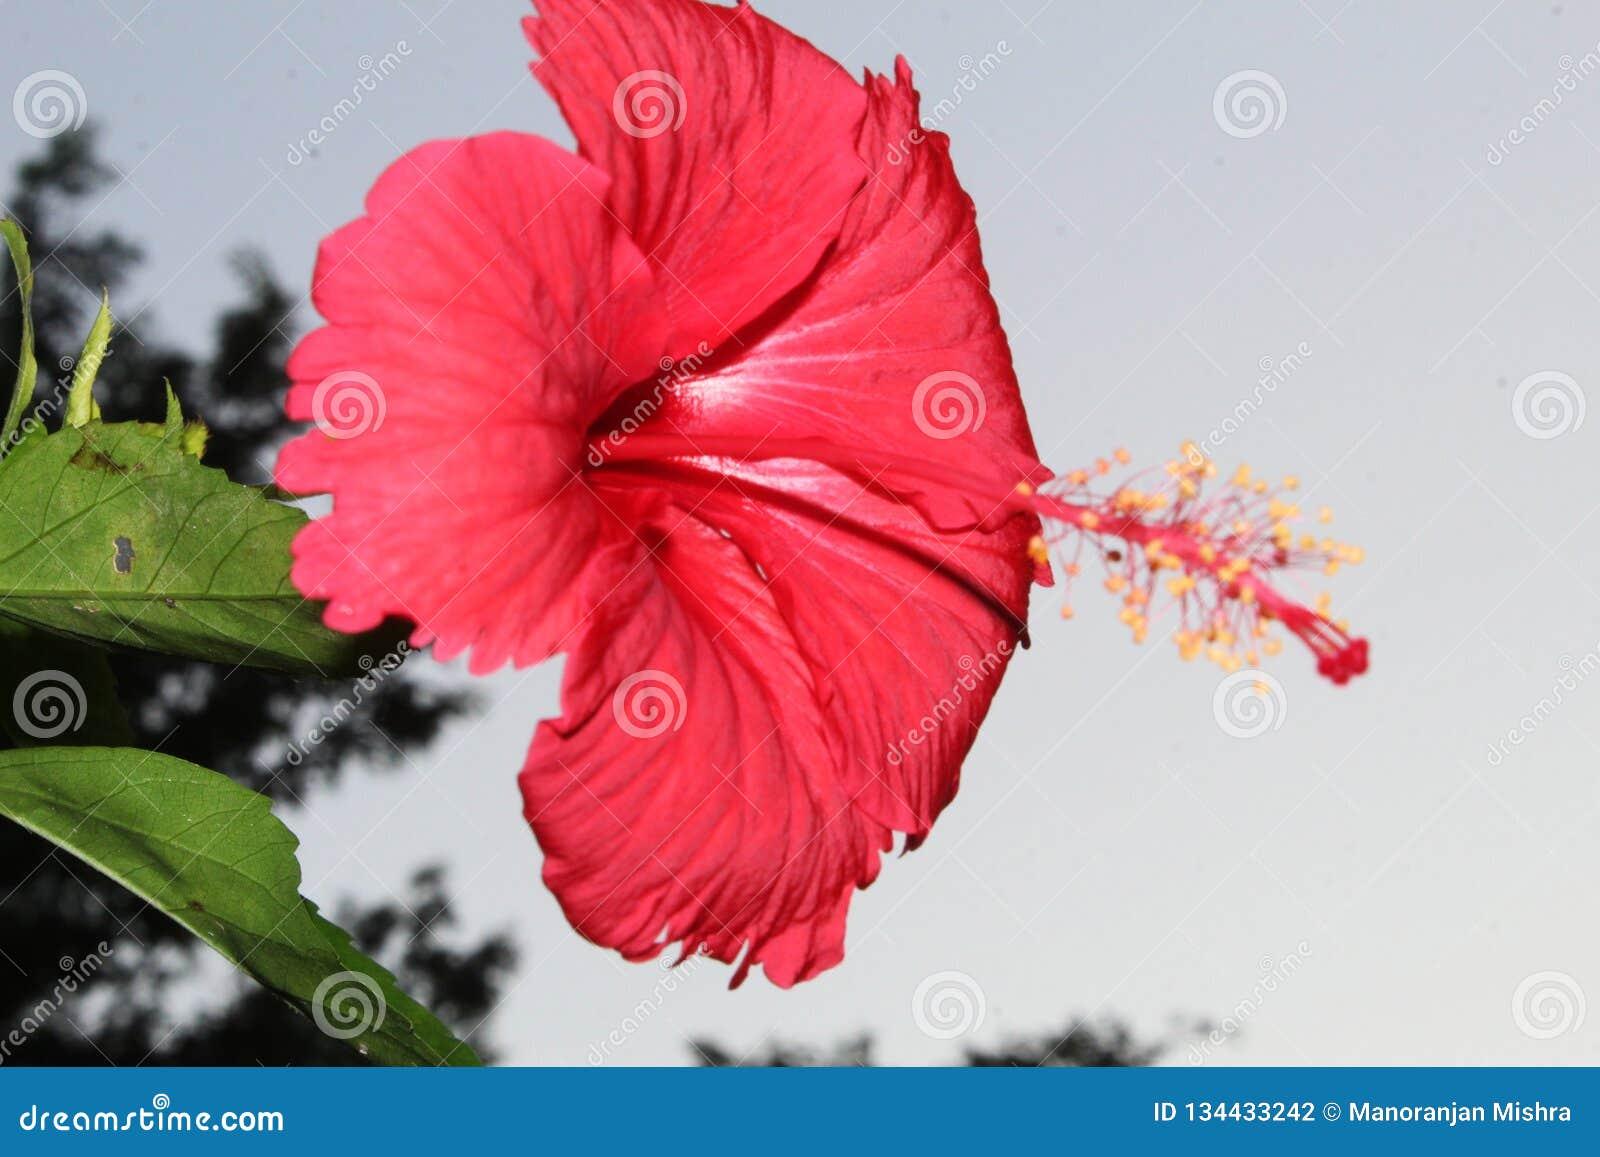 Beautiful Up Close Of Red Hibiscushibiscus Flowerhawaiian Flowers